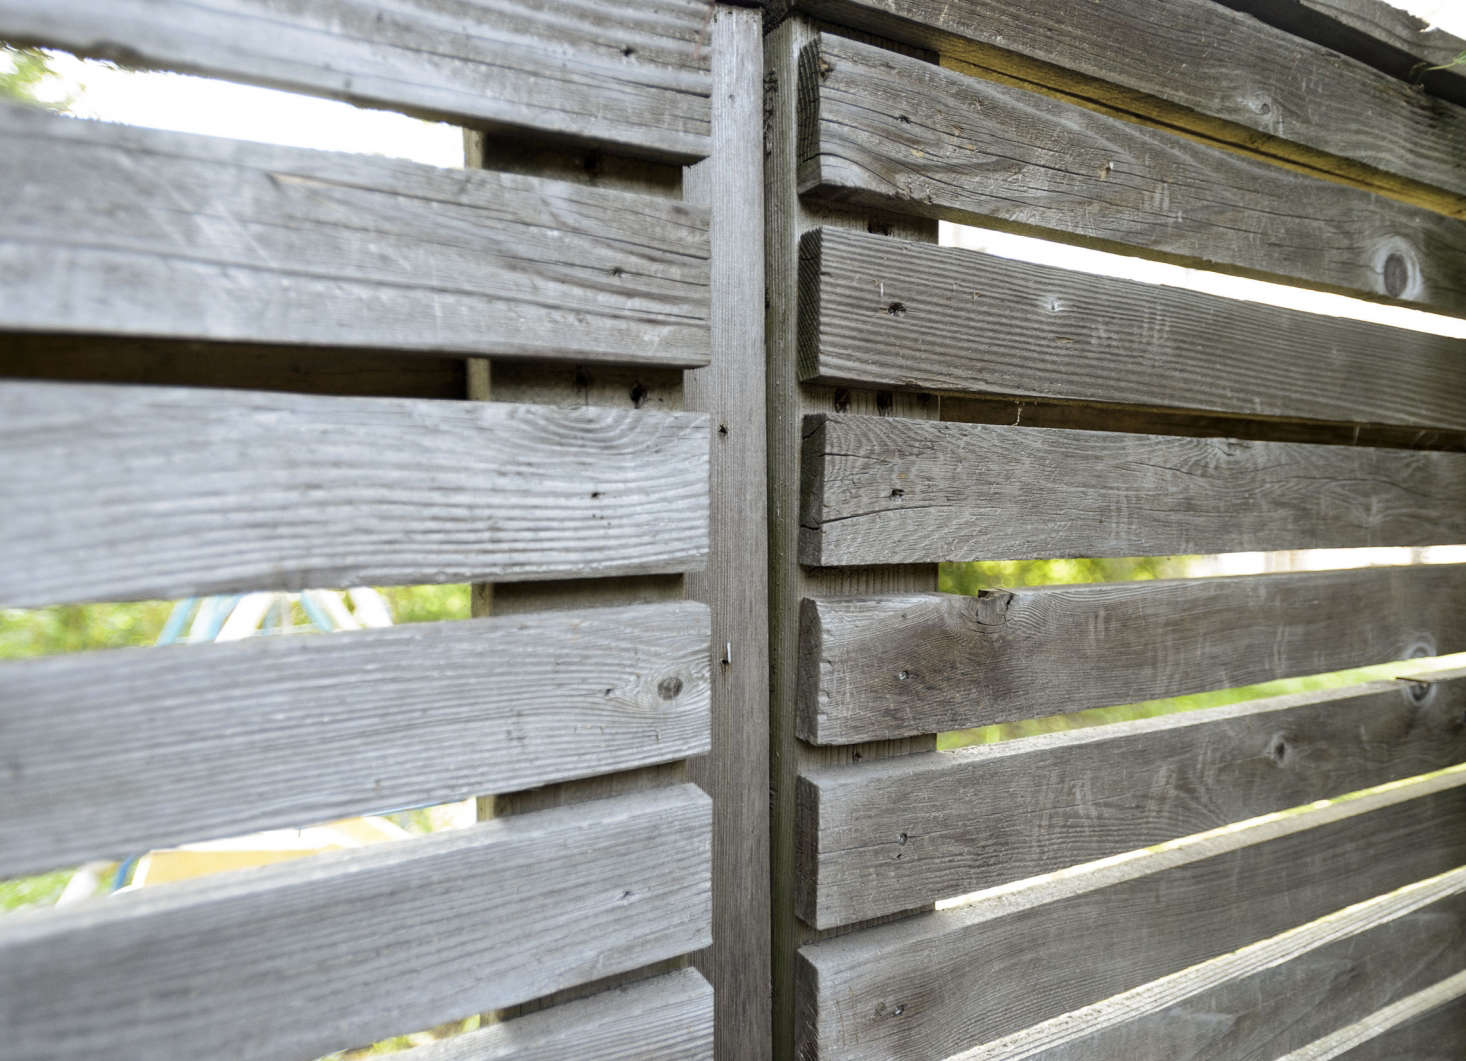 Open spaces between fence slats allow light to enter a garden, making a Brooklyn backyard feel airier.